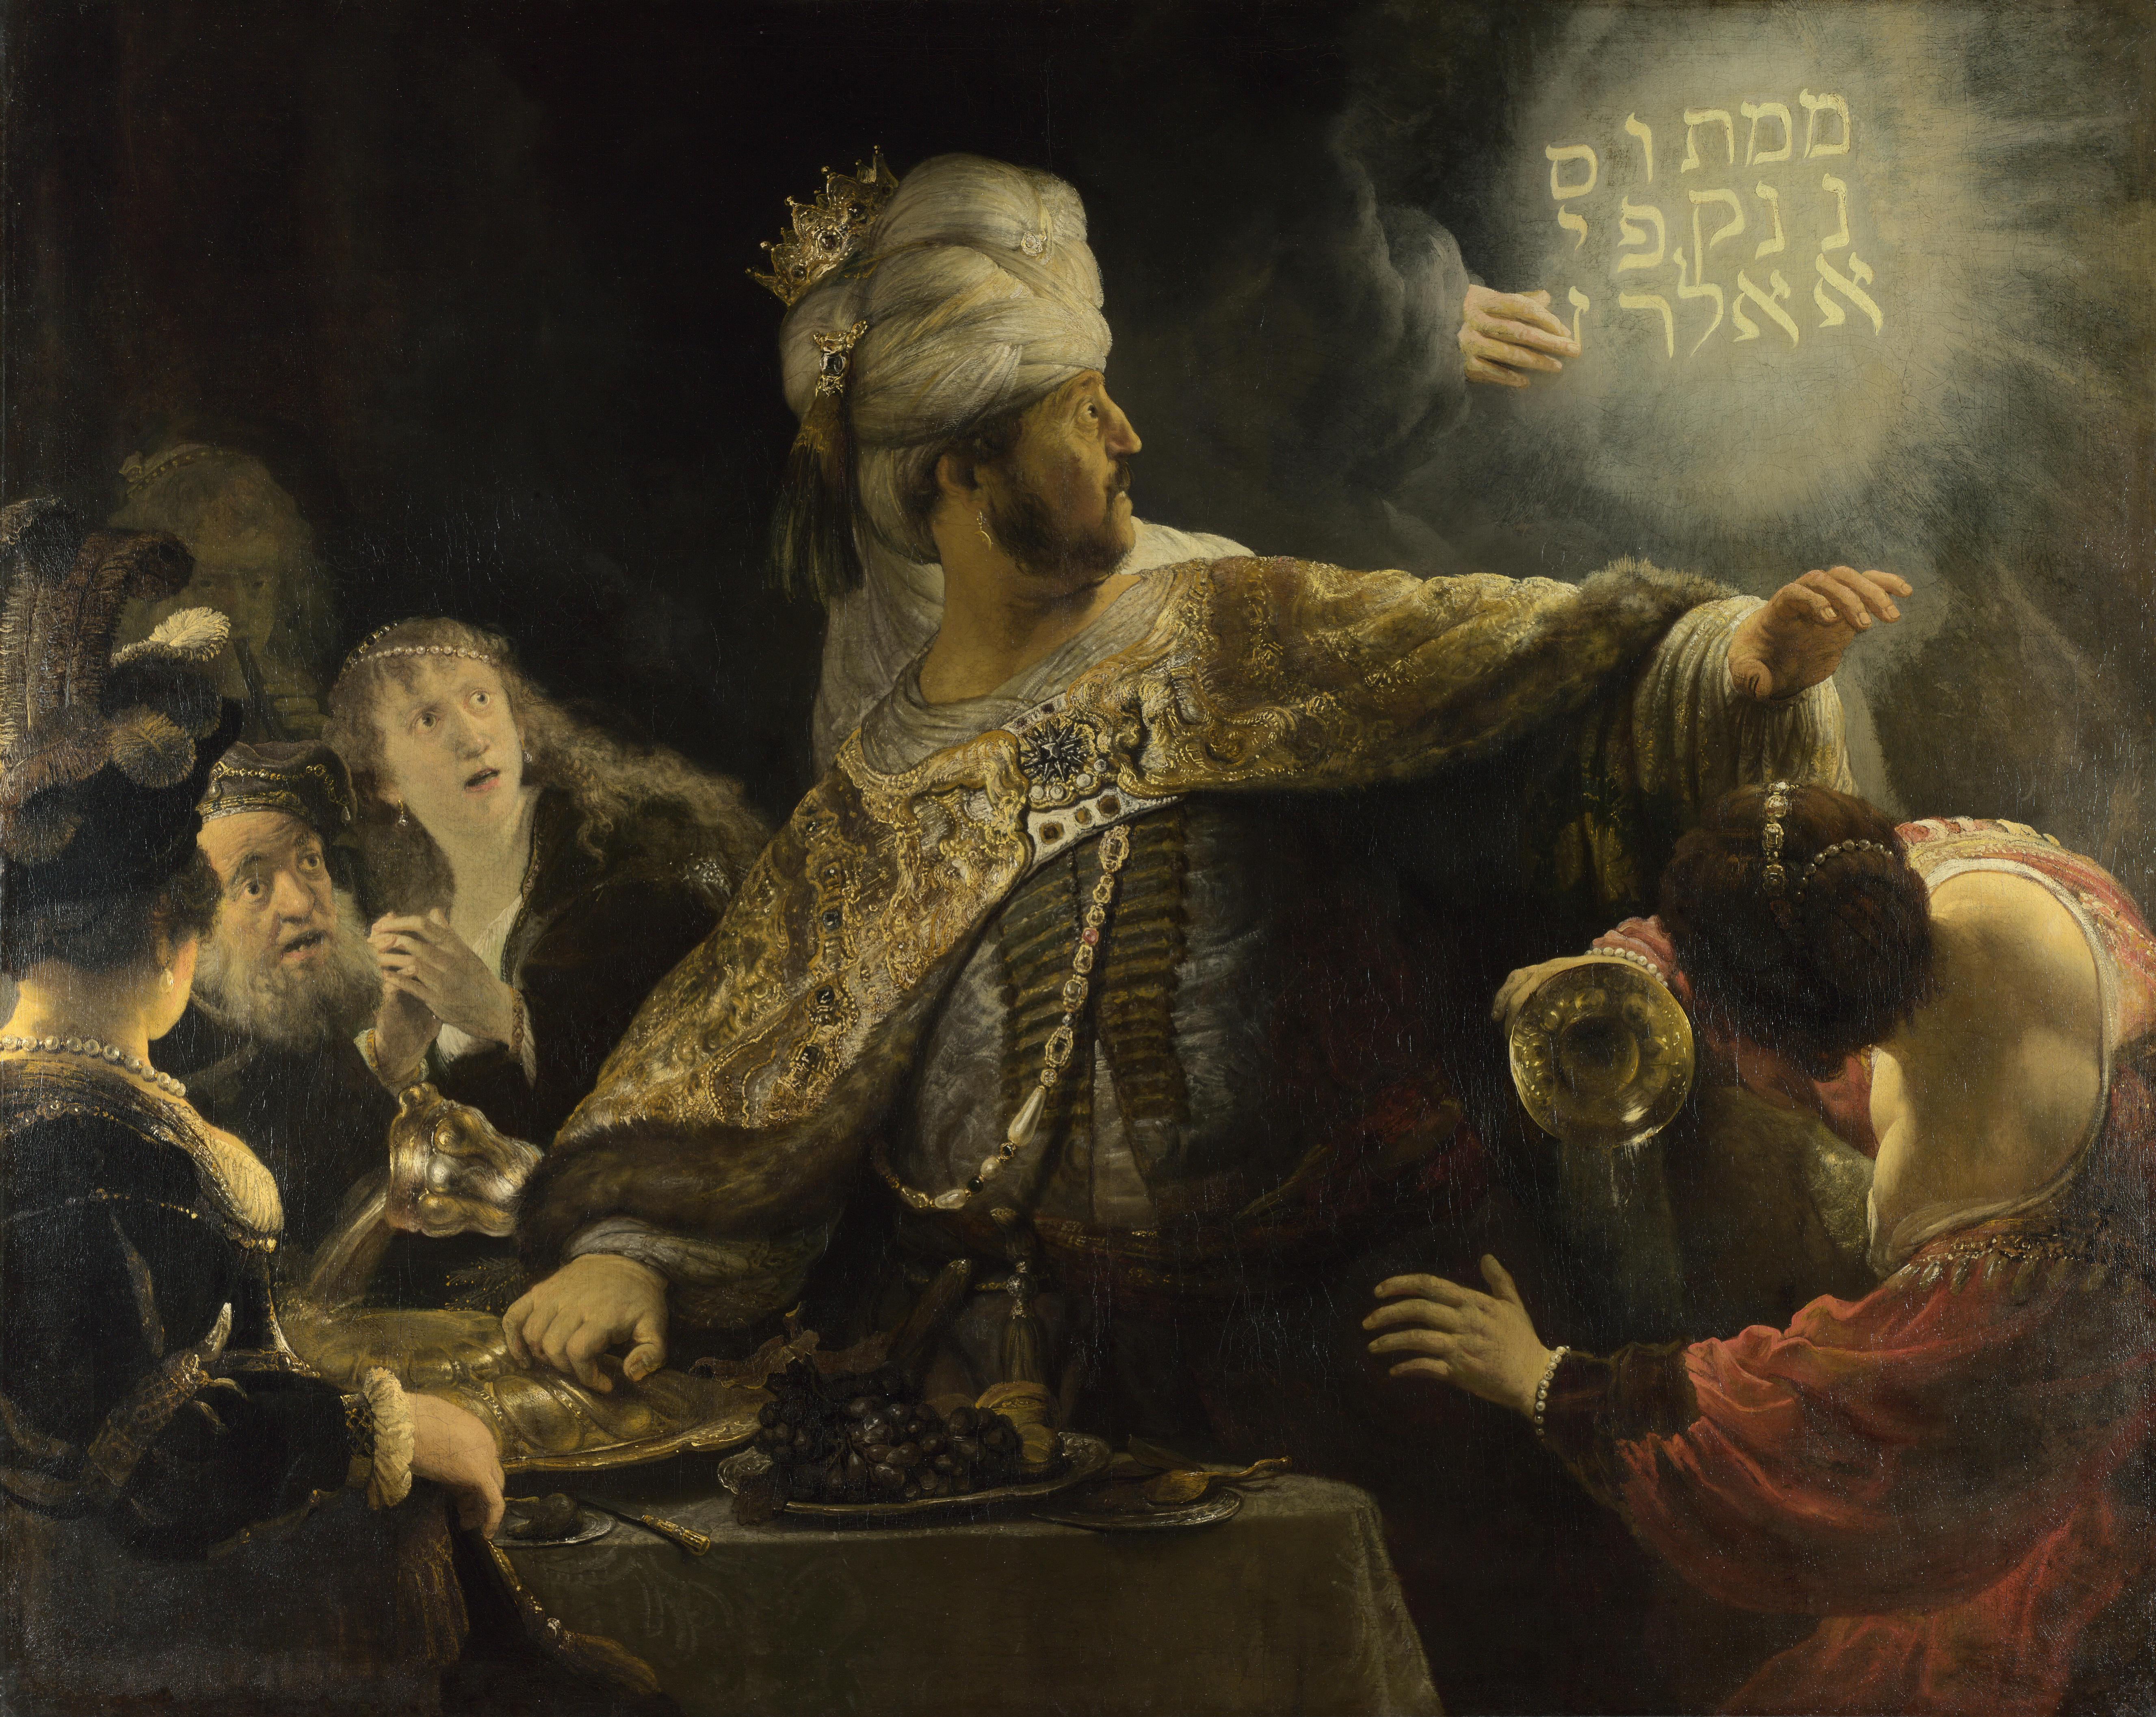 http://upload.wikimedia.org/wikipedia/commons/0/0e/Rembrandt-Belsazar.jpg